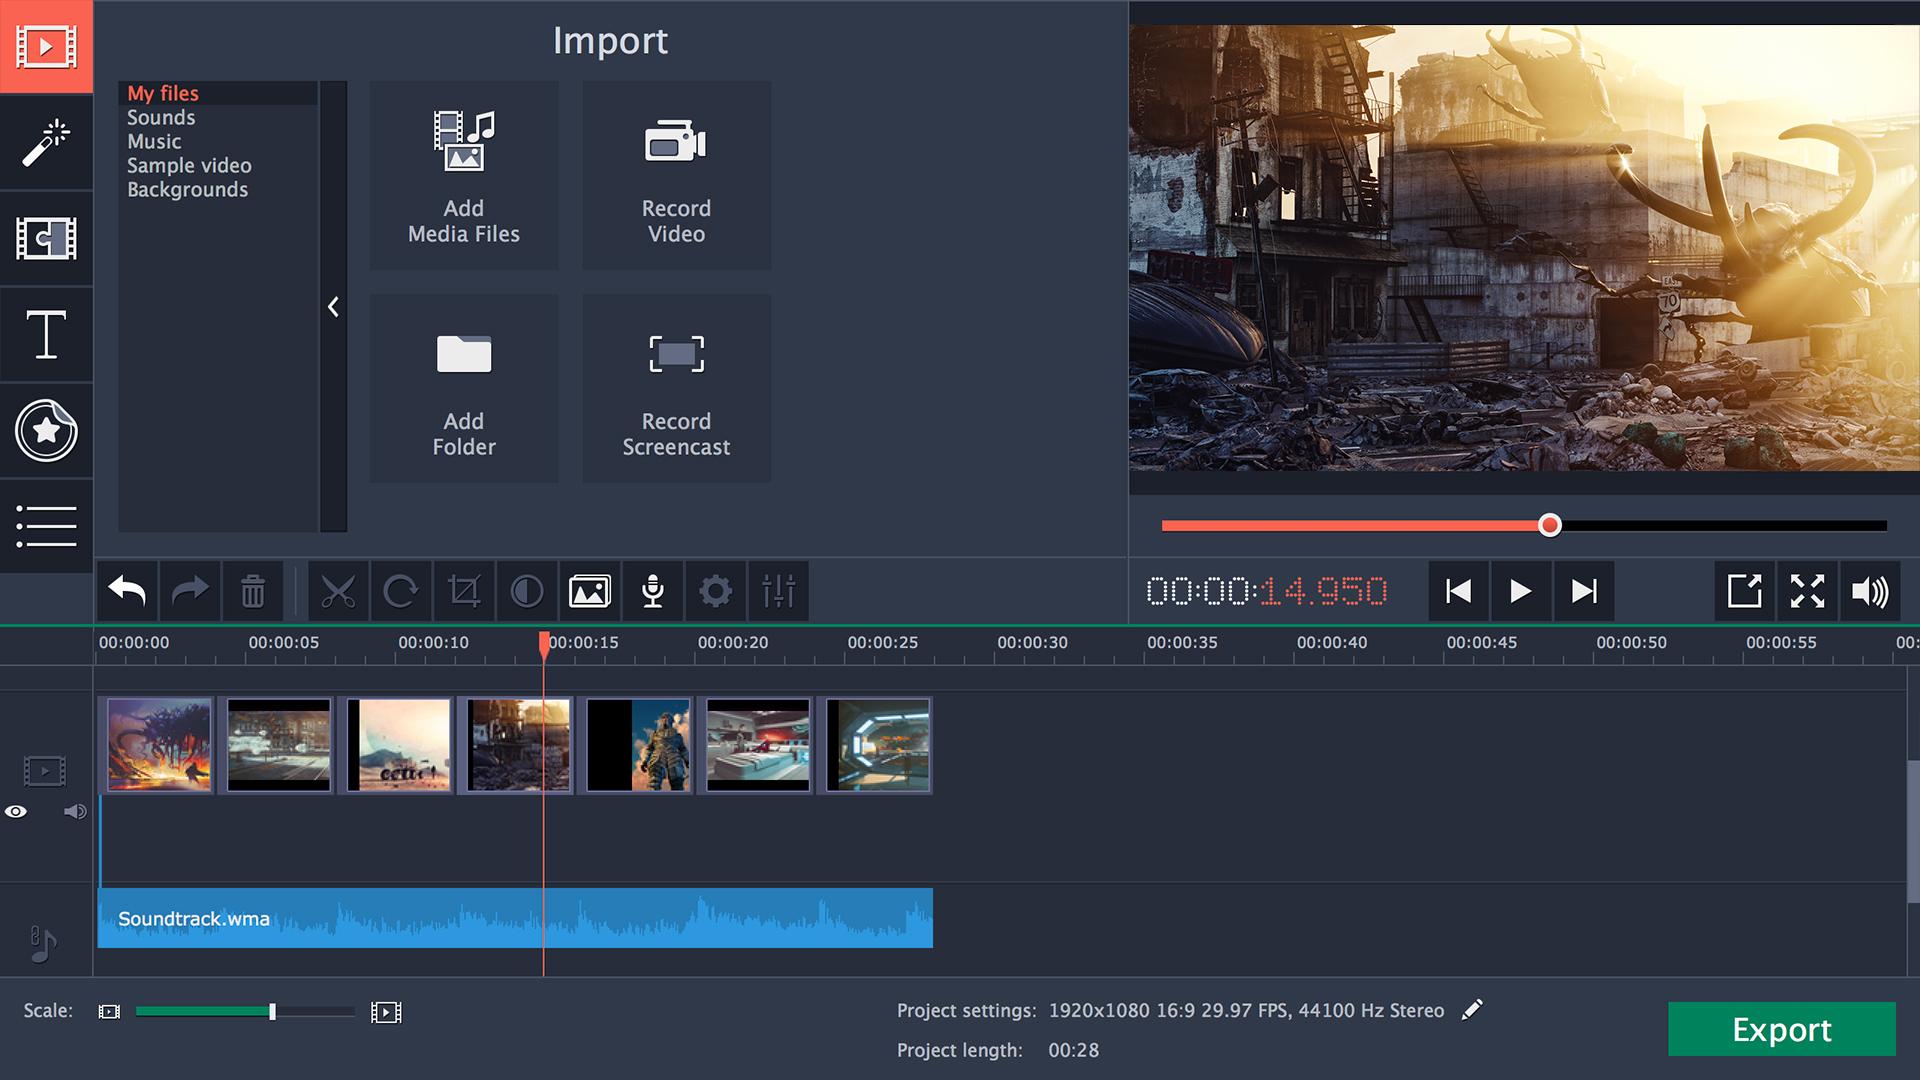 movavi video editor free download for windows 10